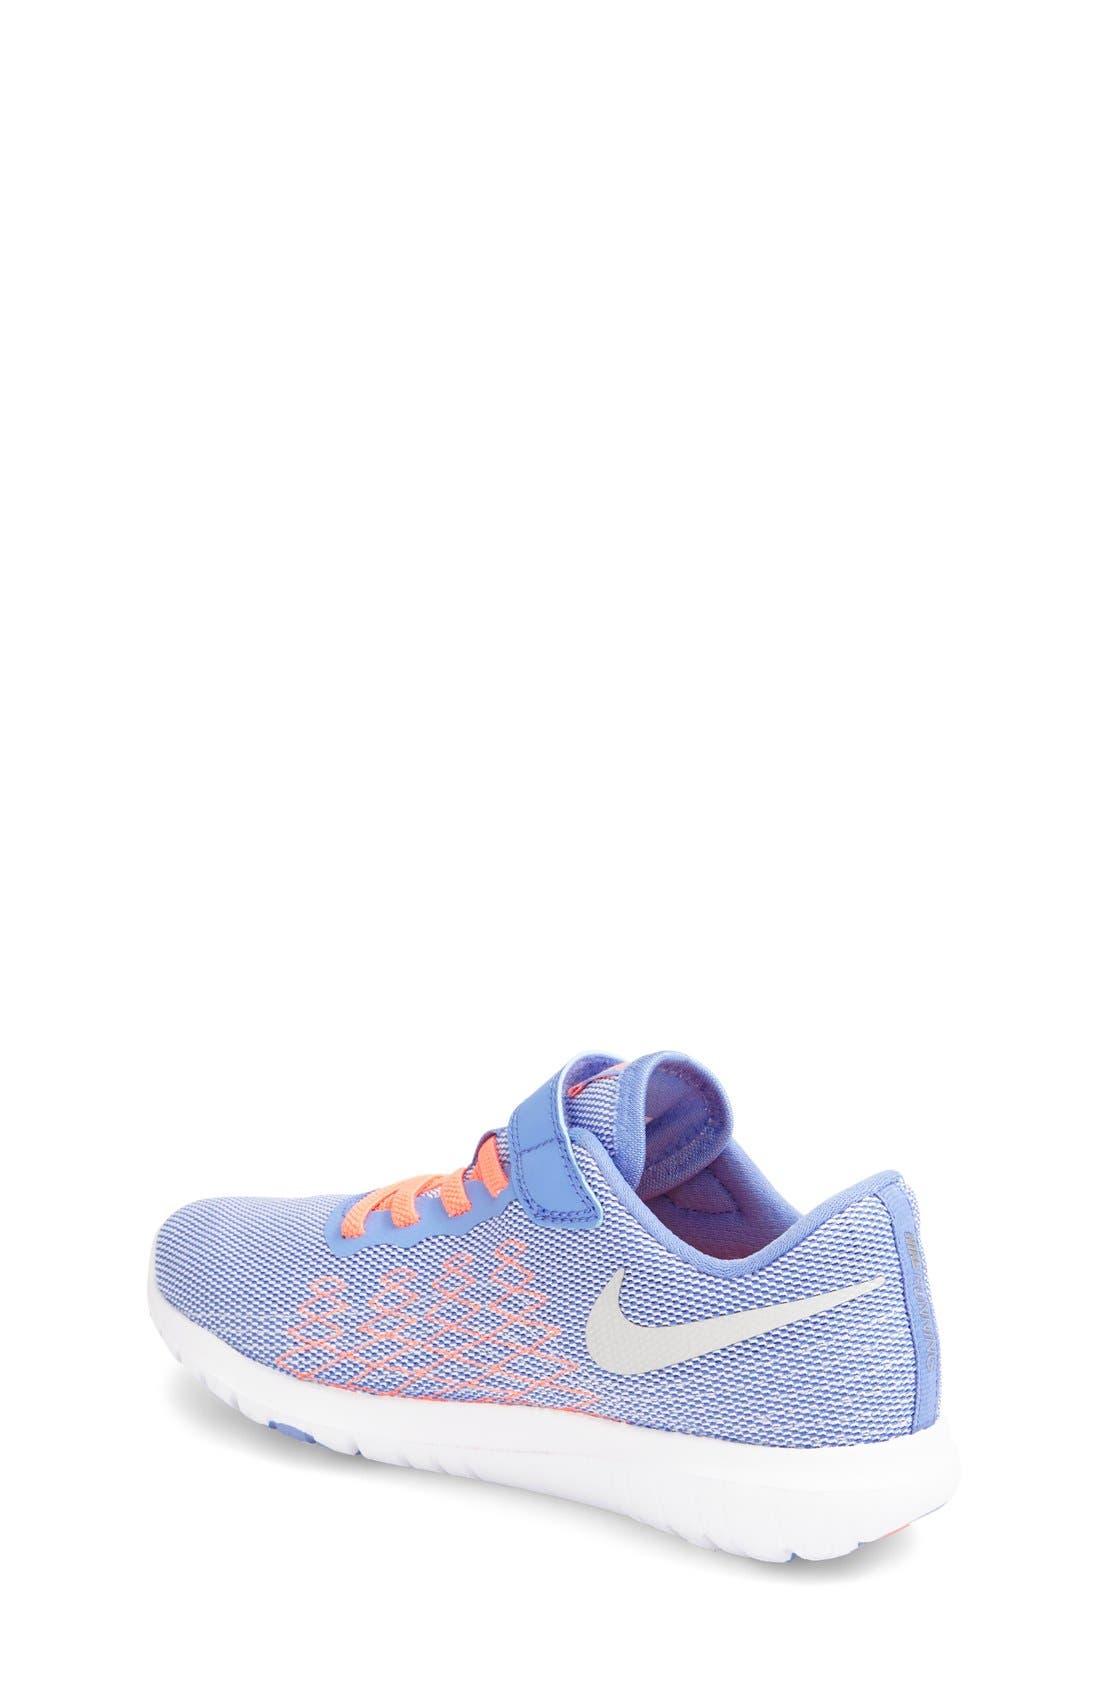 Alternate Image 2  - Nike 'Flex Fury 2' Athletic Shoe (Toddler & Little Kid)